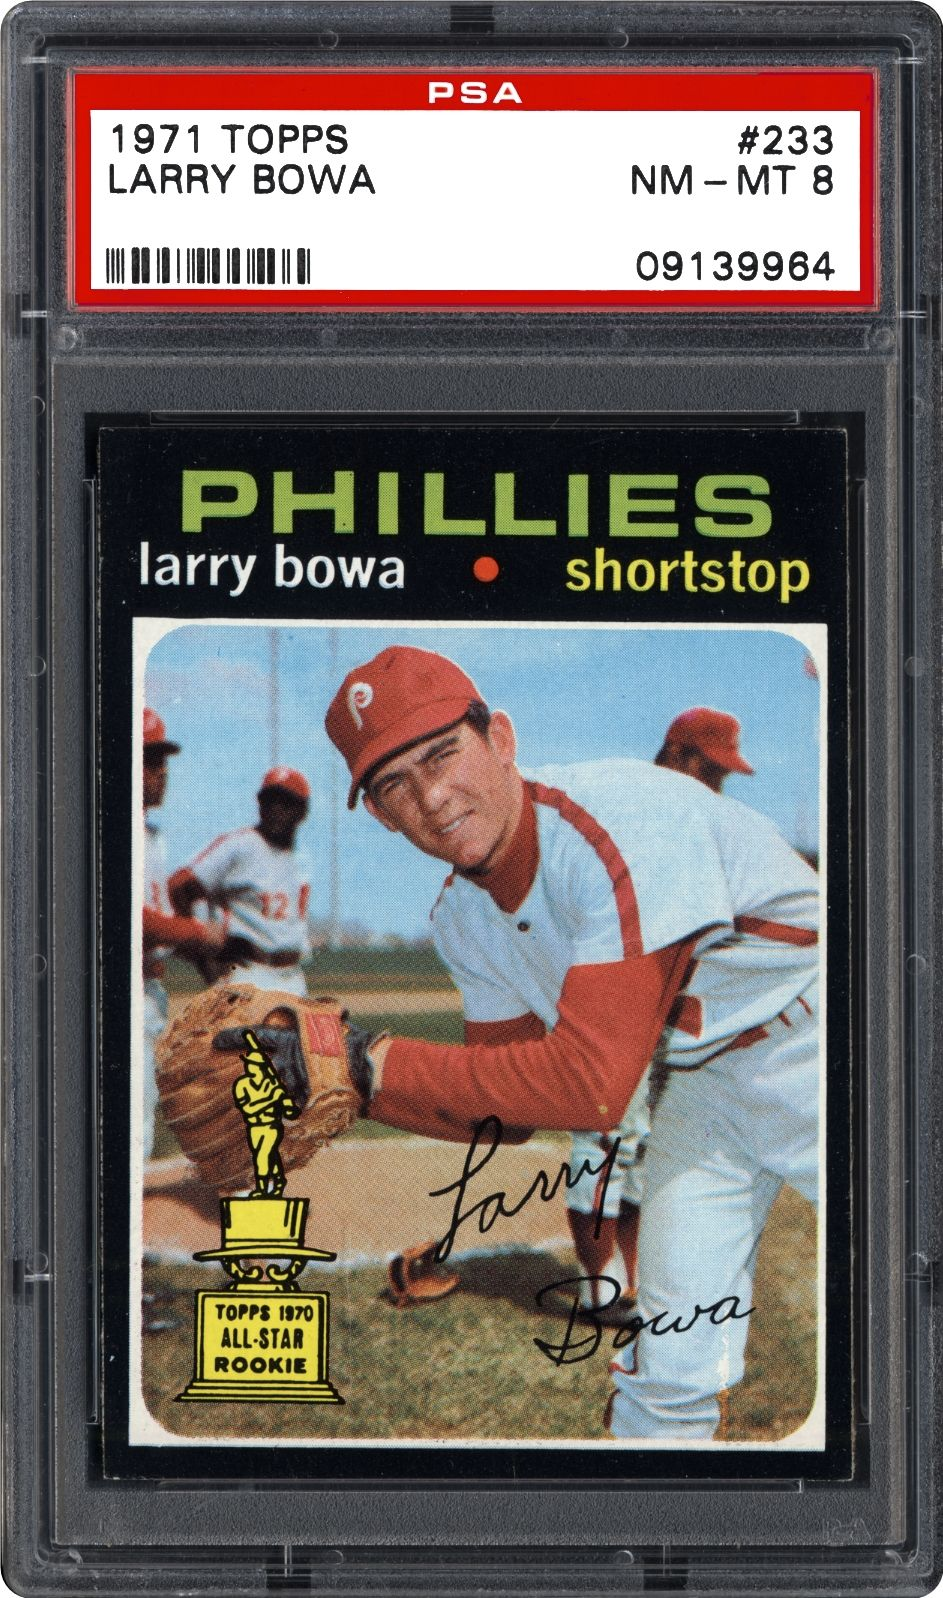 1971 topps 233 larry bowa baseball cards phillies